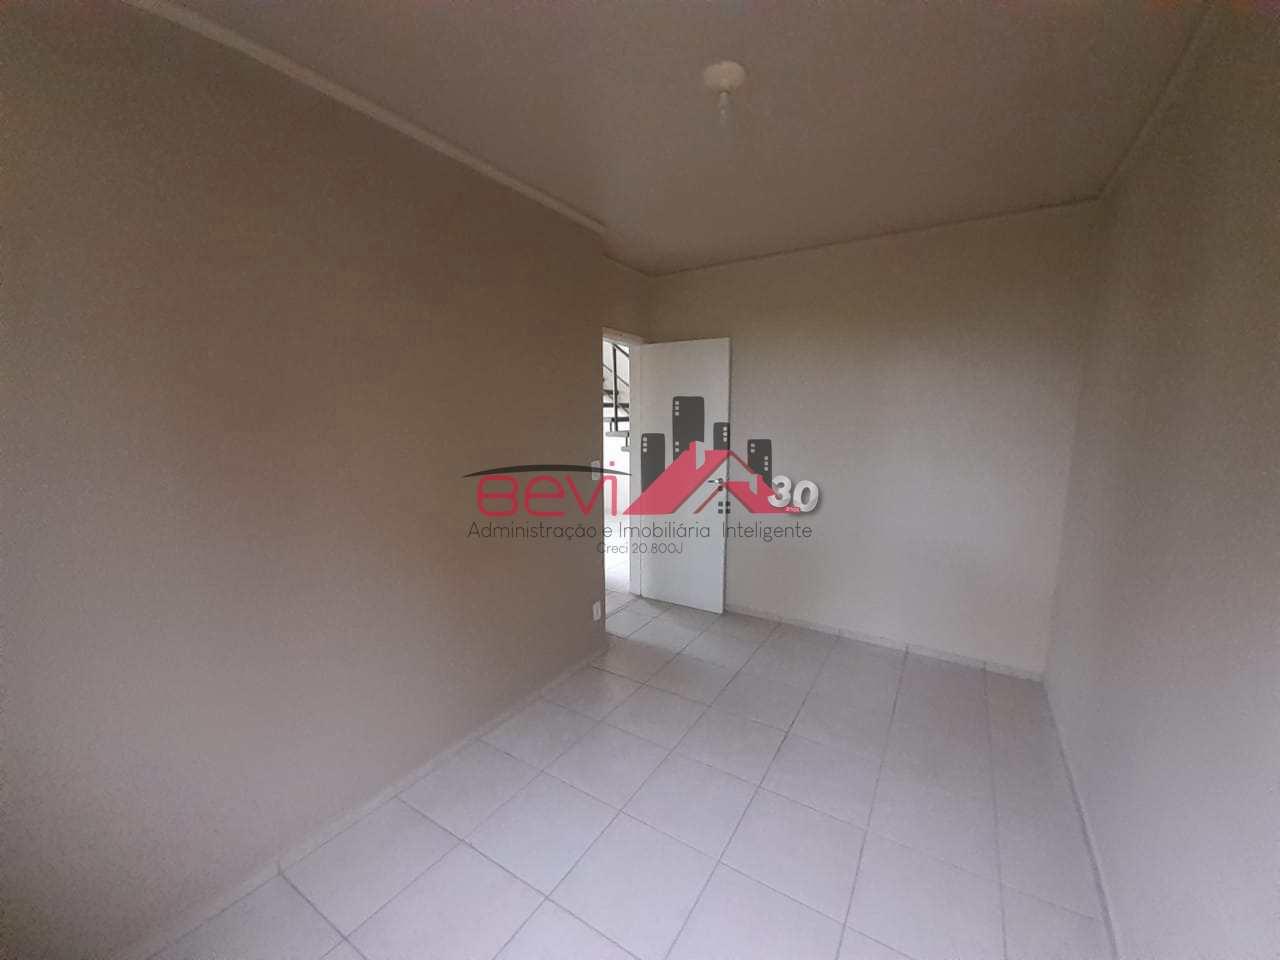 Cobertura com 108 m². Grande Oportunidade de Compra!